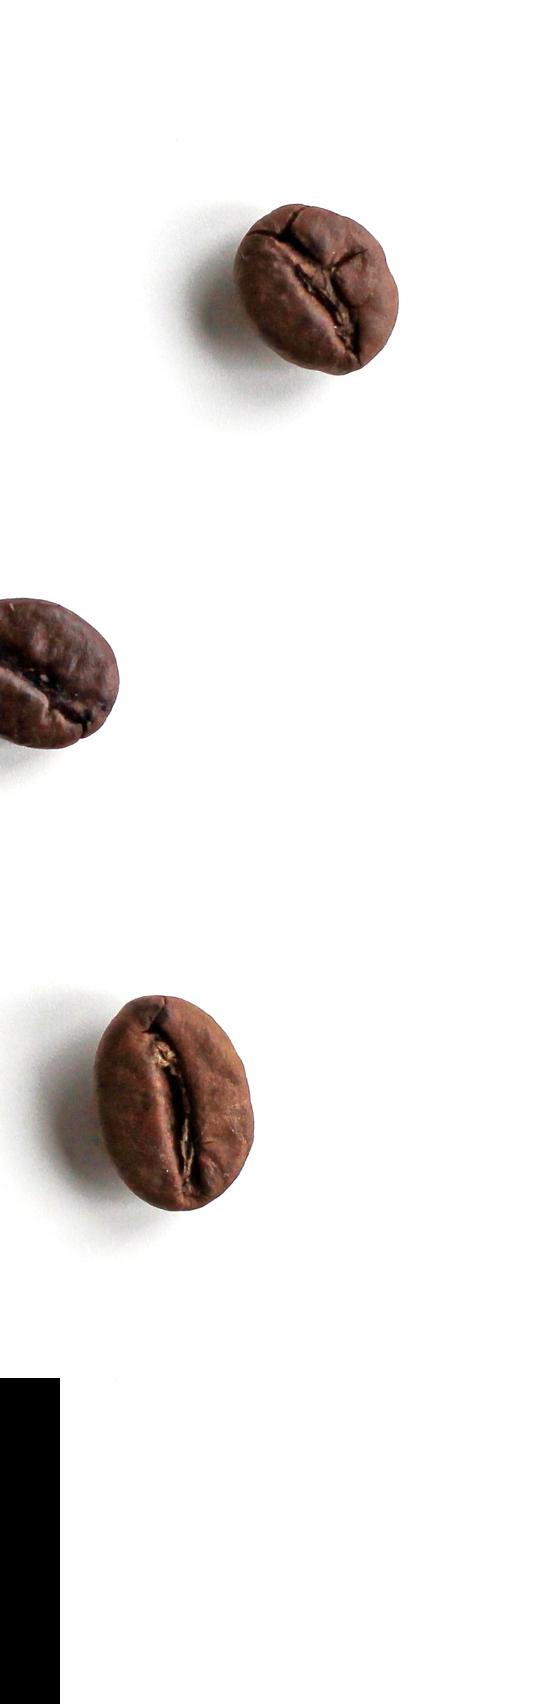 coffee bean parallax image